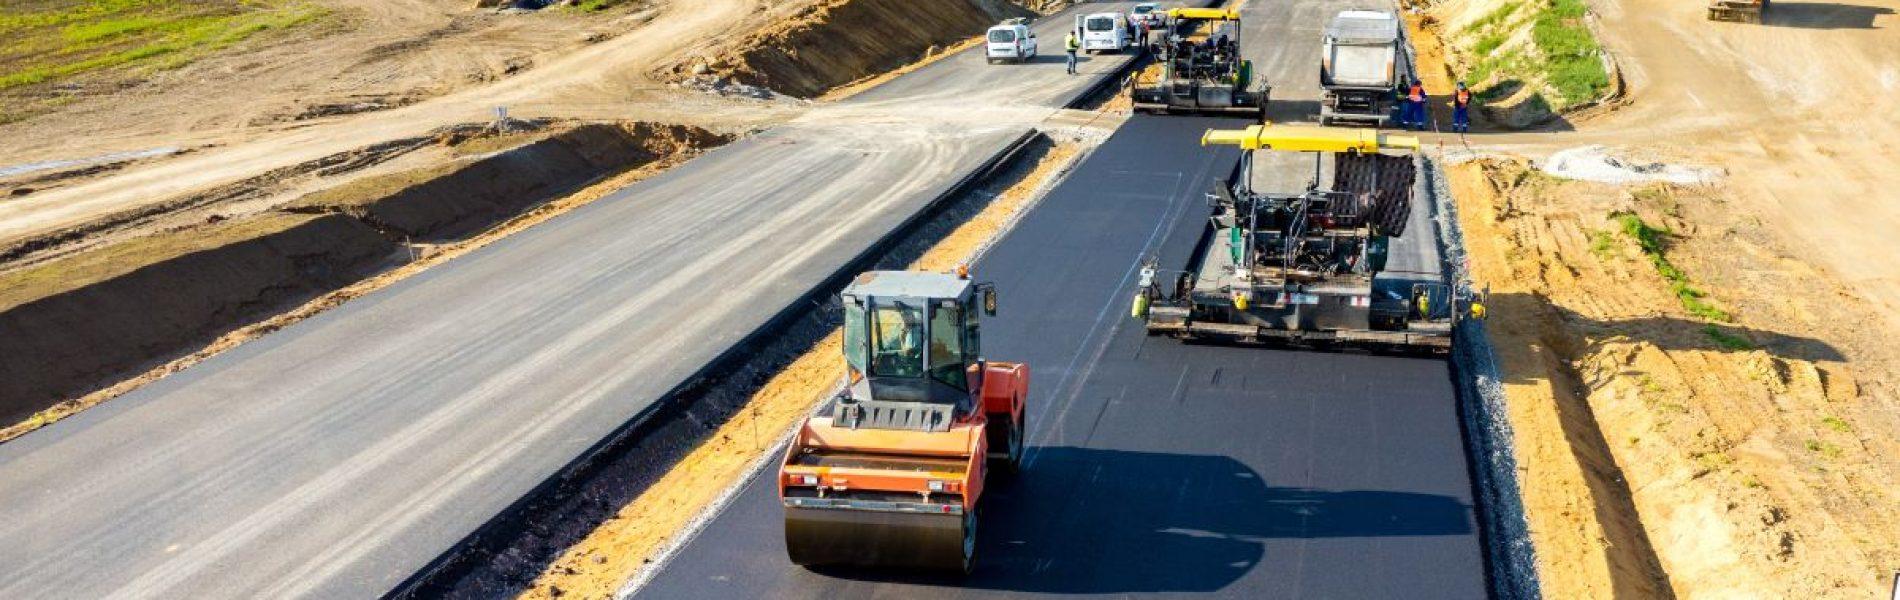 XenomatiX_Road_Construction_Maintenance_Lidar_Market